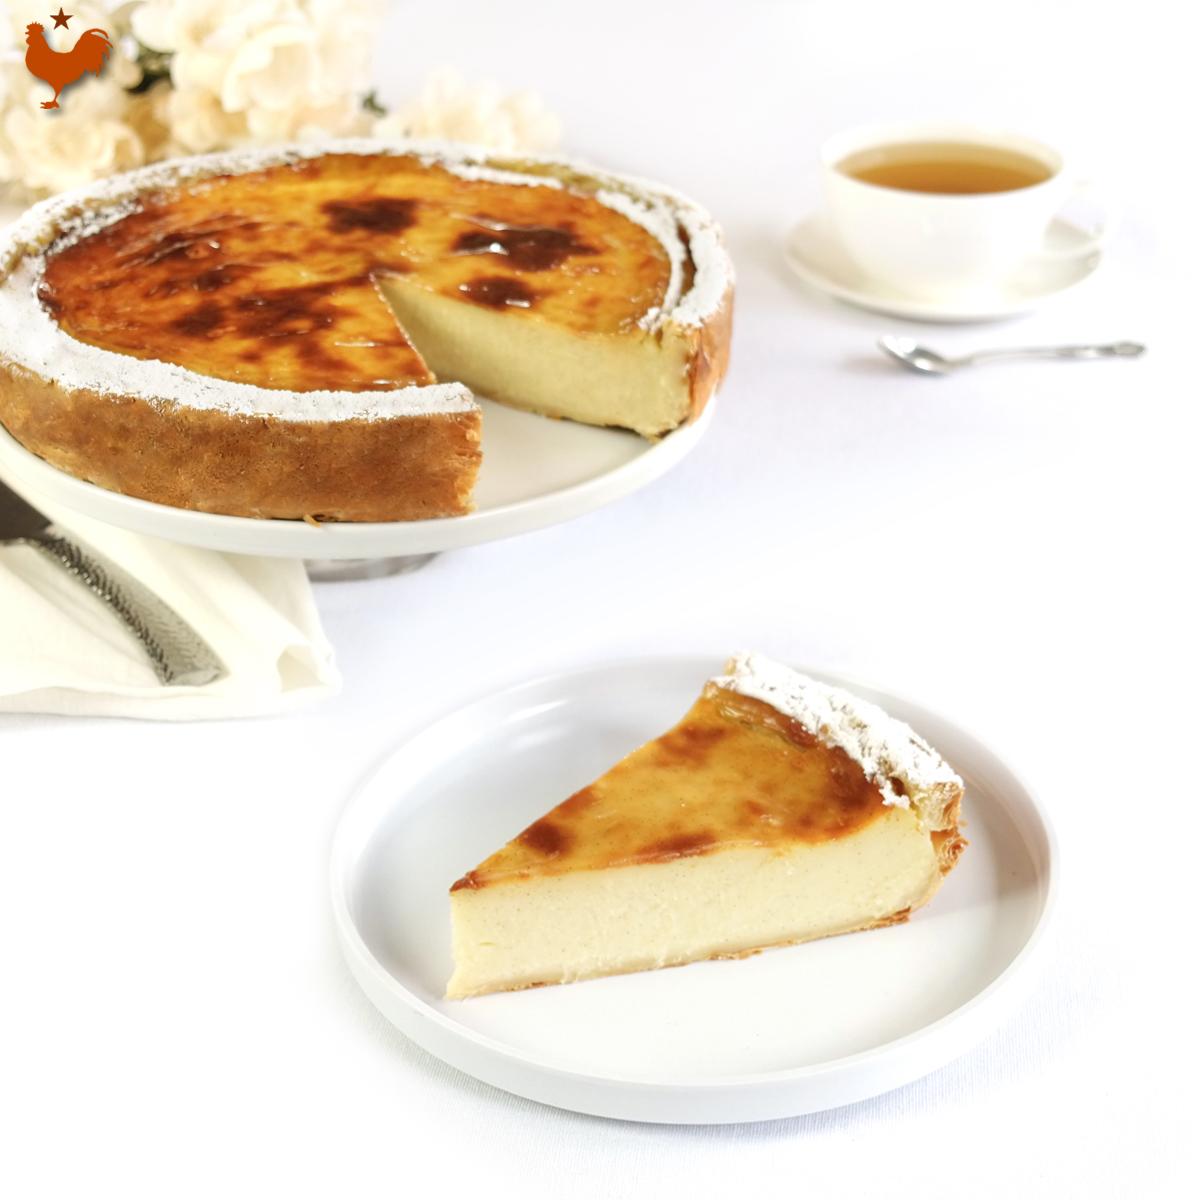 Stéphane Glacier's Parisian Flan Pie